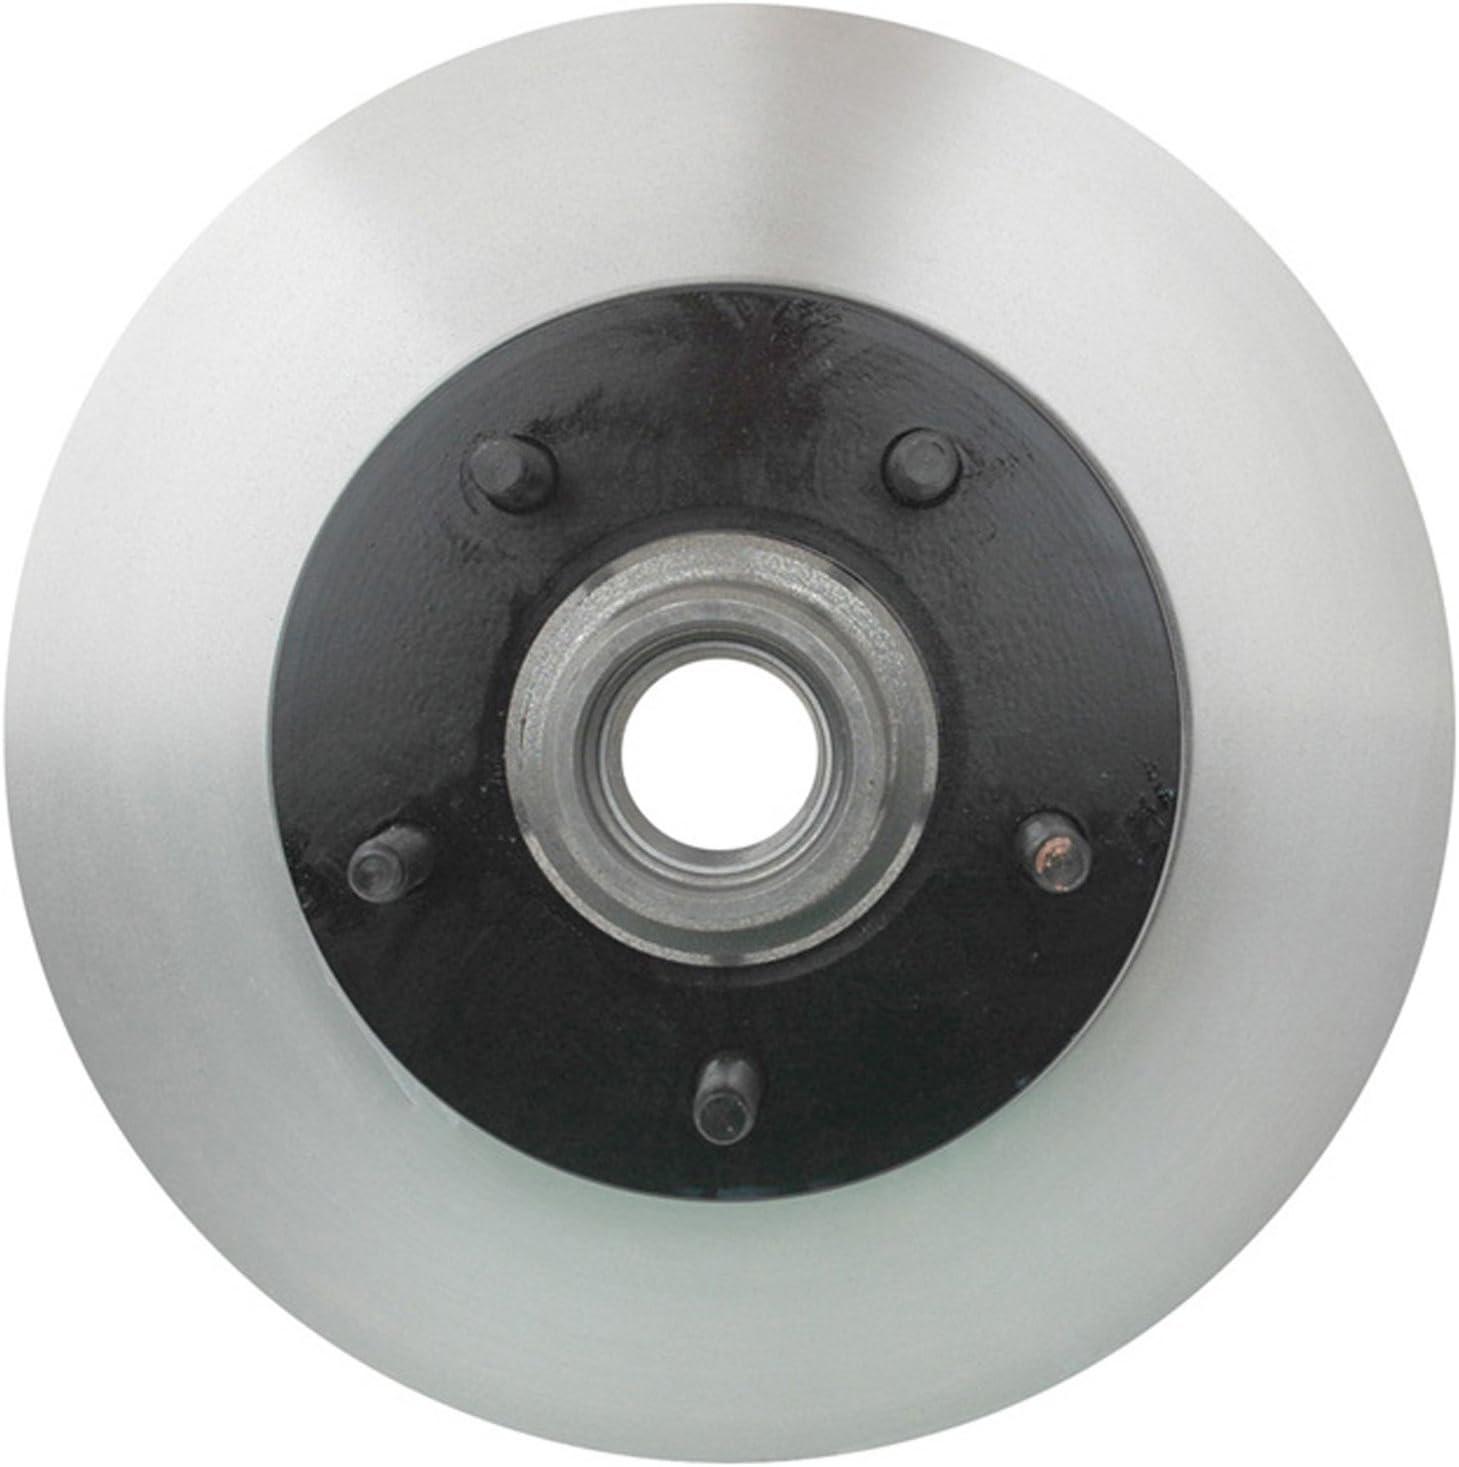 4pcs NGK Standard Spark Plugs Stock 3230 Nickel Core Tip Standard 0.024in BR9EG Set